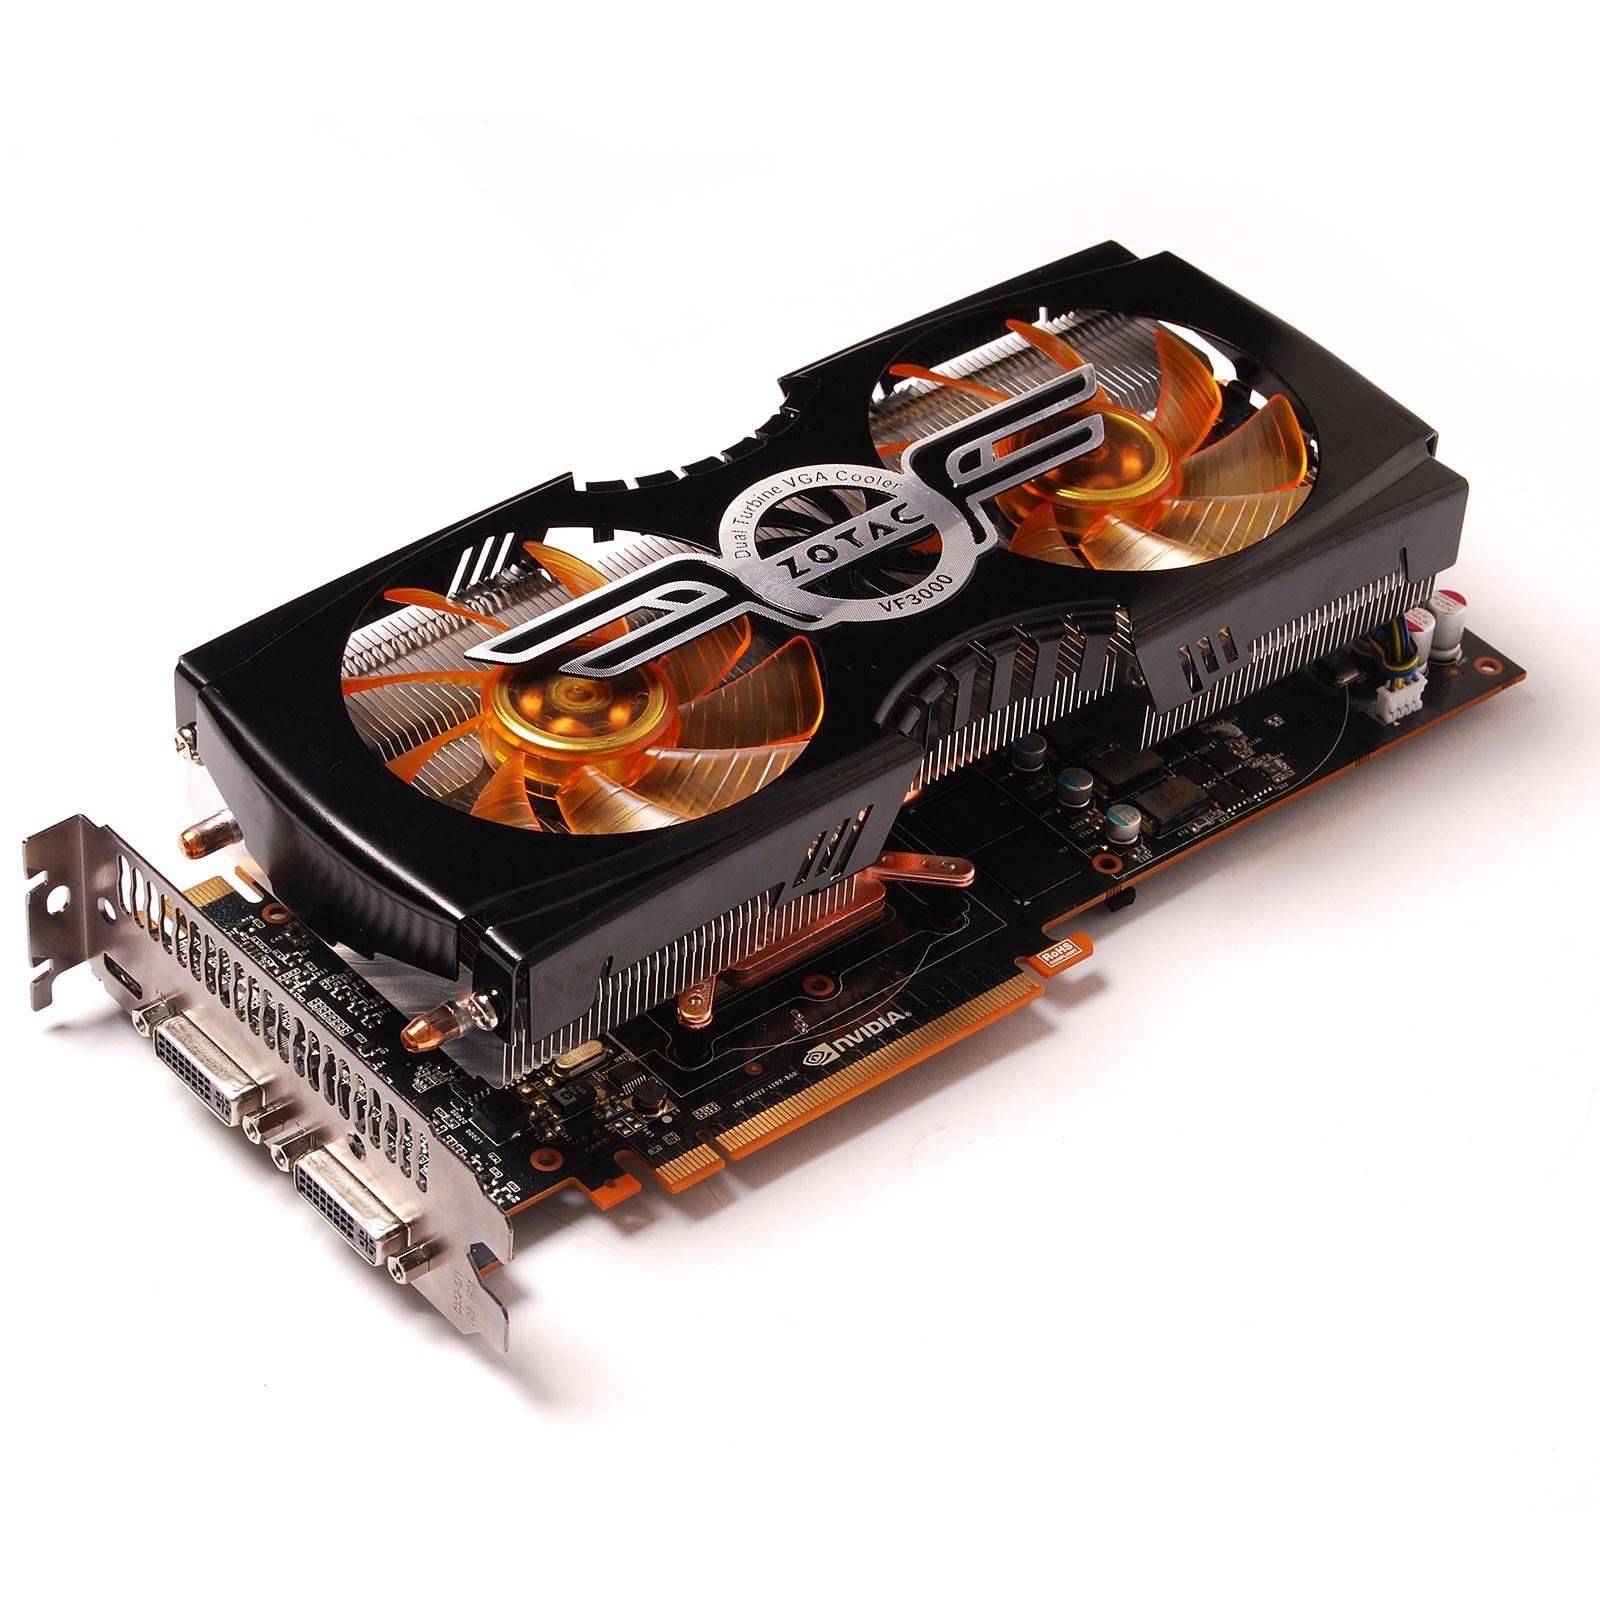 ZOTAC GeForce GTX 480 AMP! Edition 1536 MB + Just Cause 2 offert